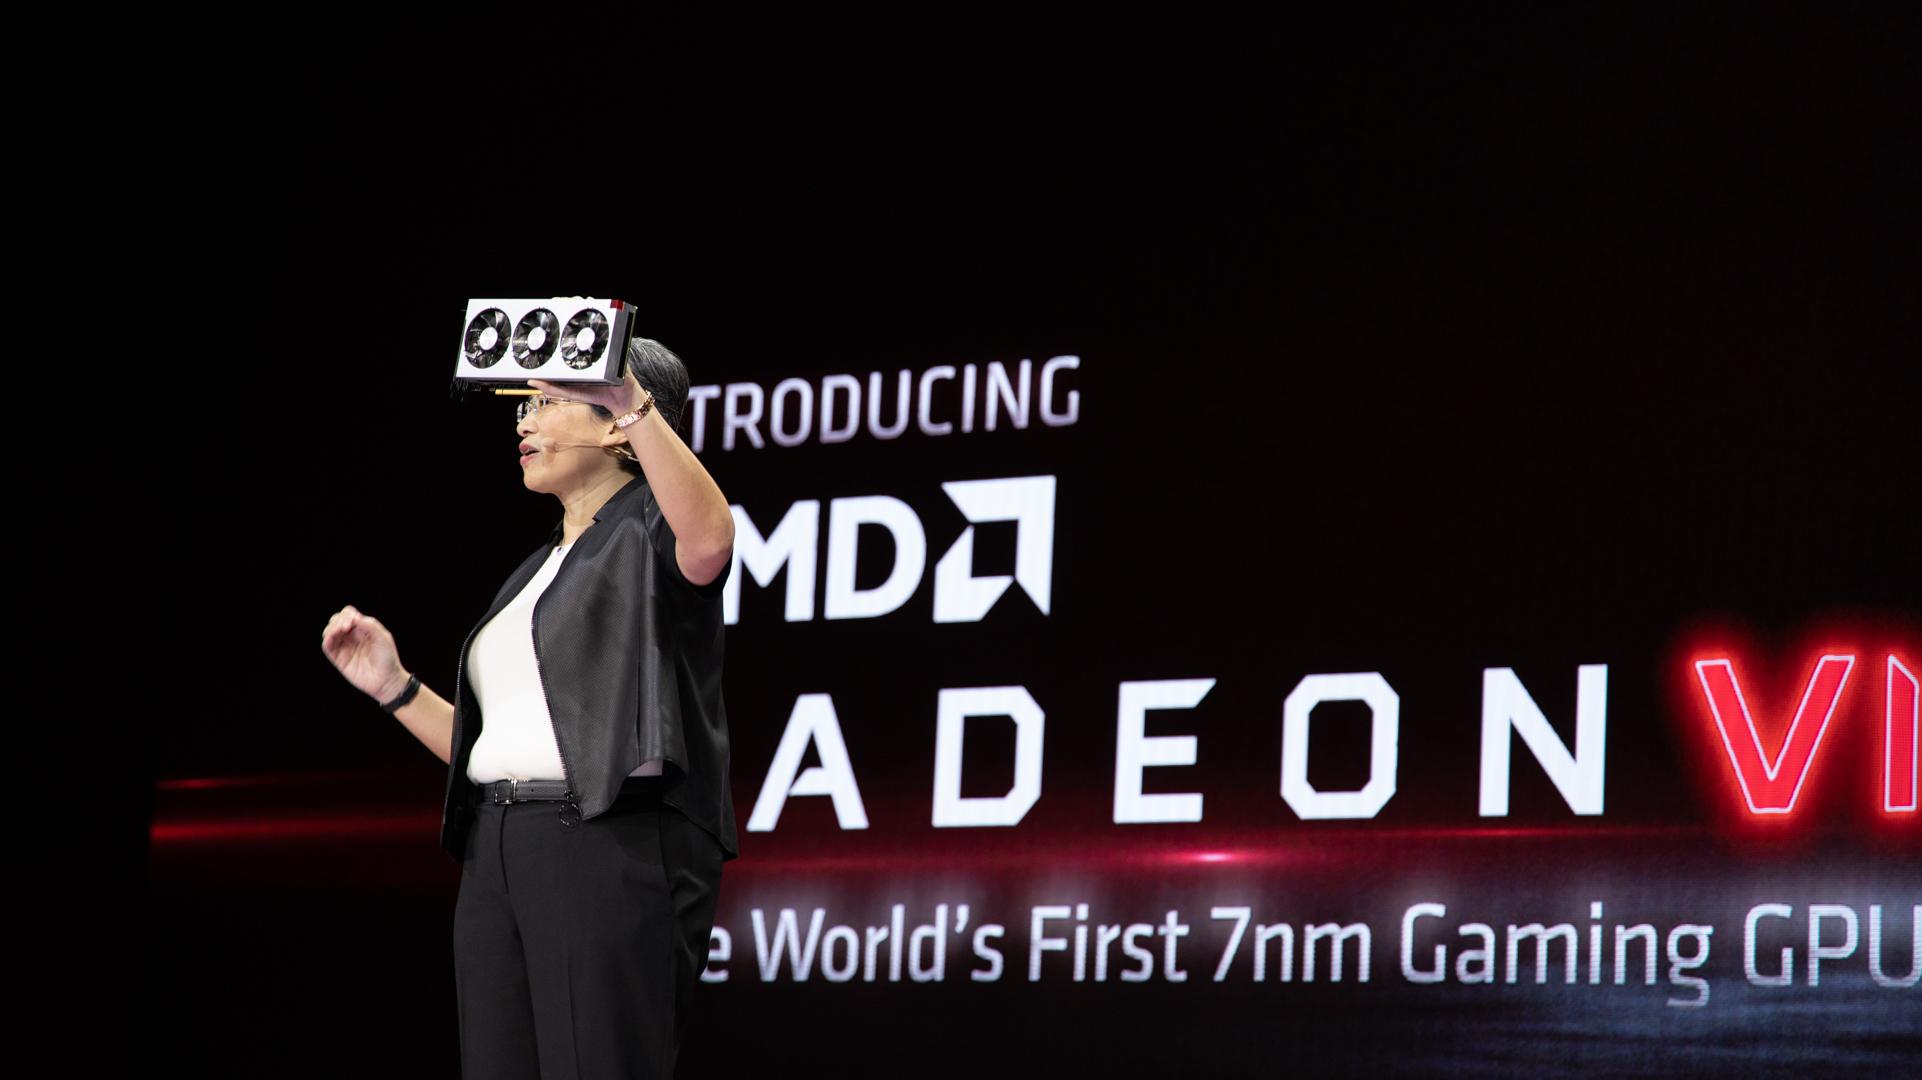 AMD debuts 7nm Radeon VII graphics card to combat Nvidia RTX